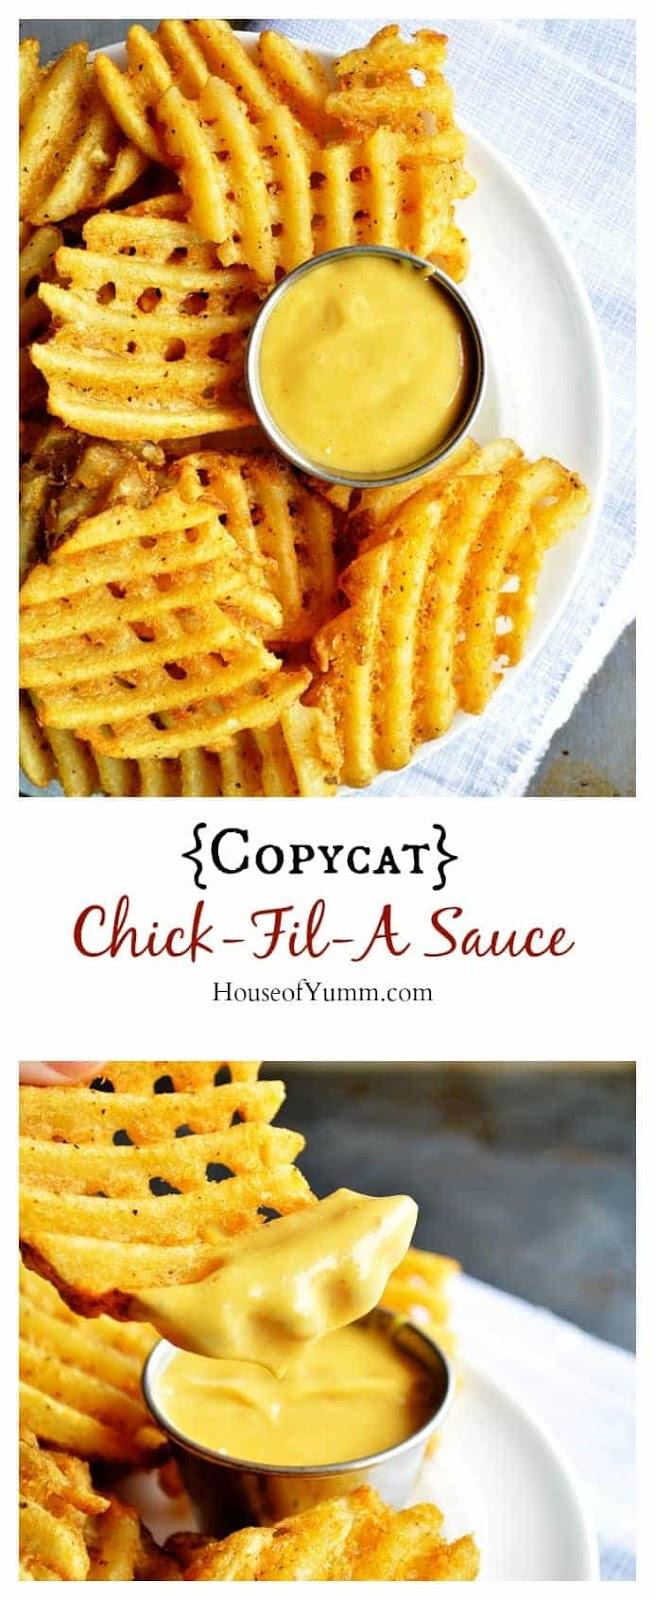 {Copycat} Chick-Fil-A Sauce